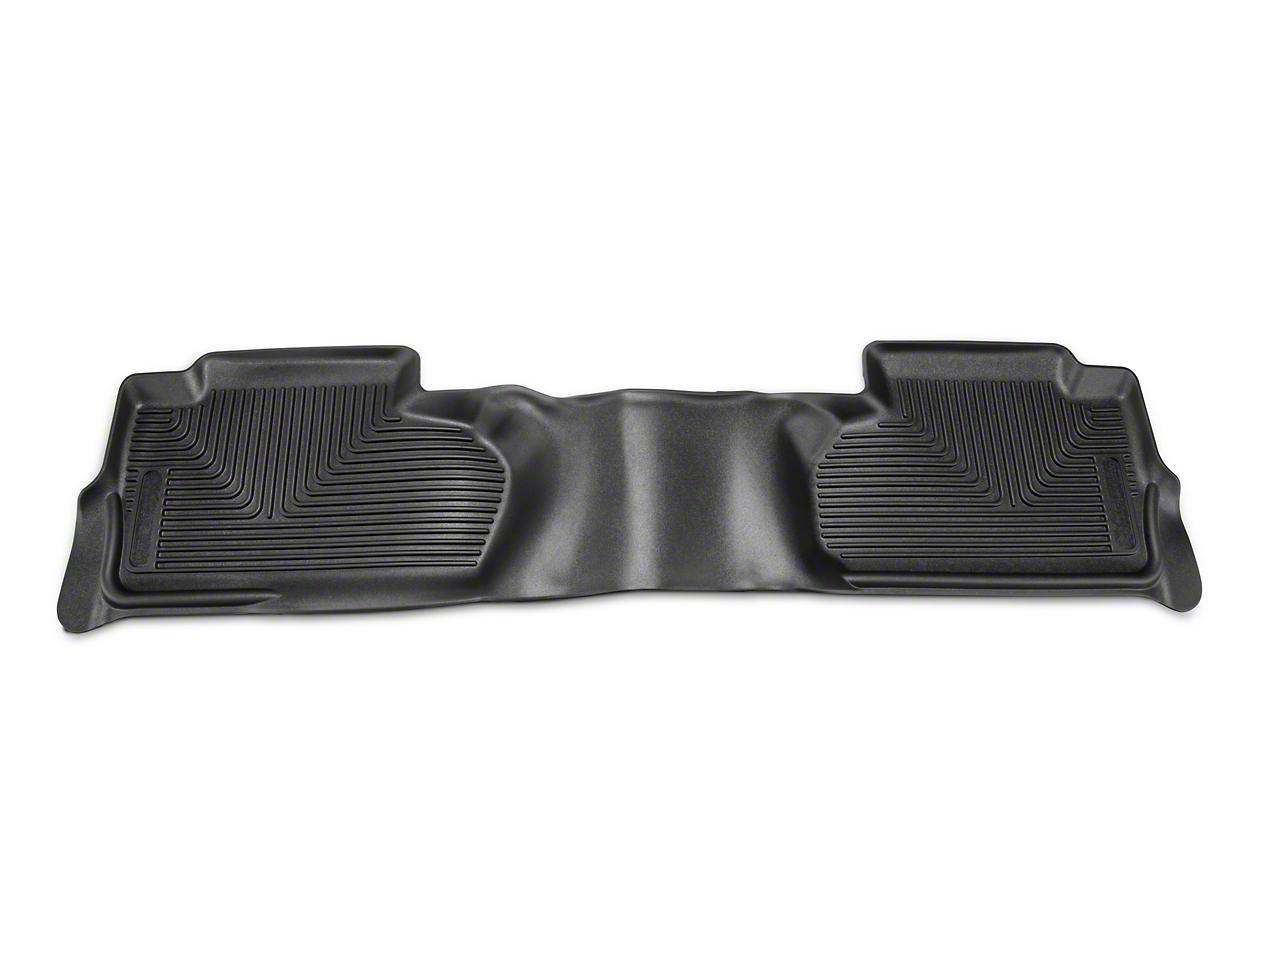 Husky X-Act Contour 2nd Seat Floor Liner - Black (14-18 Silverado 1500 Double Cab, Crew Cab)